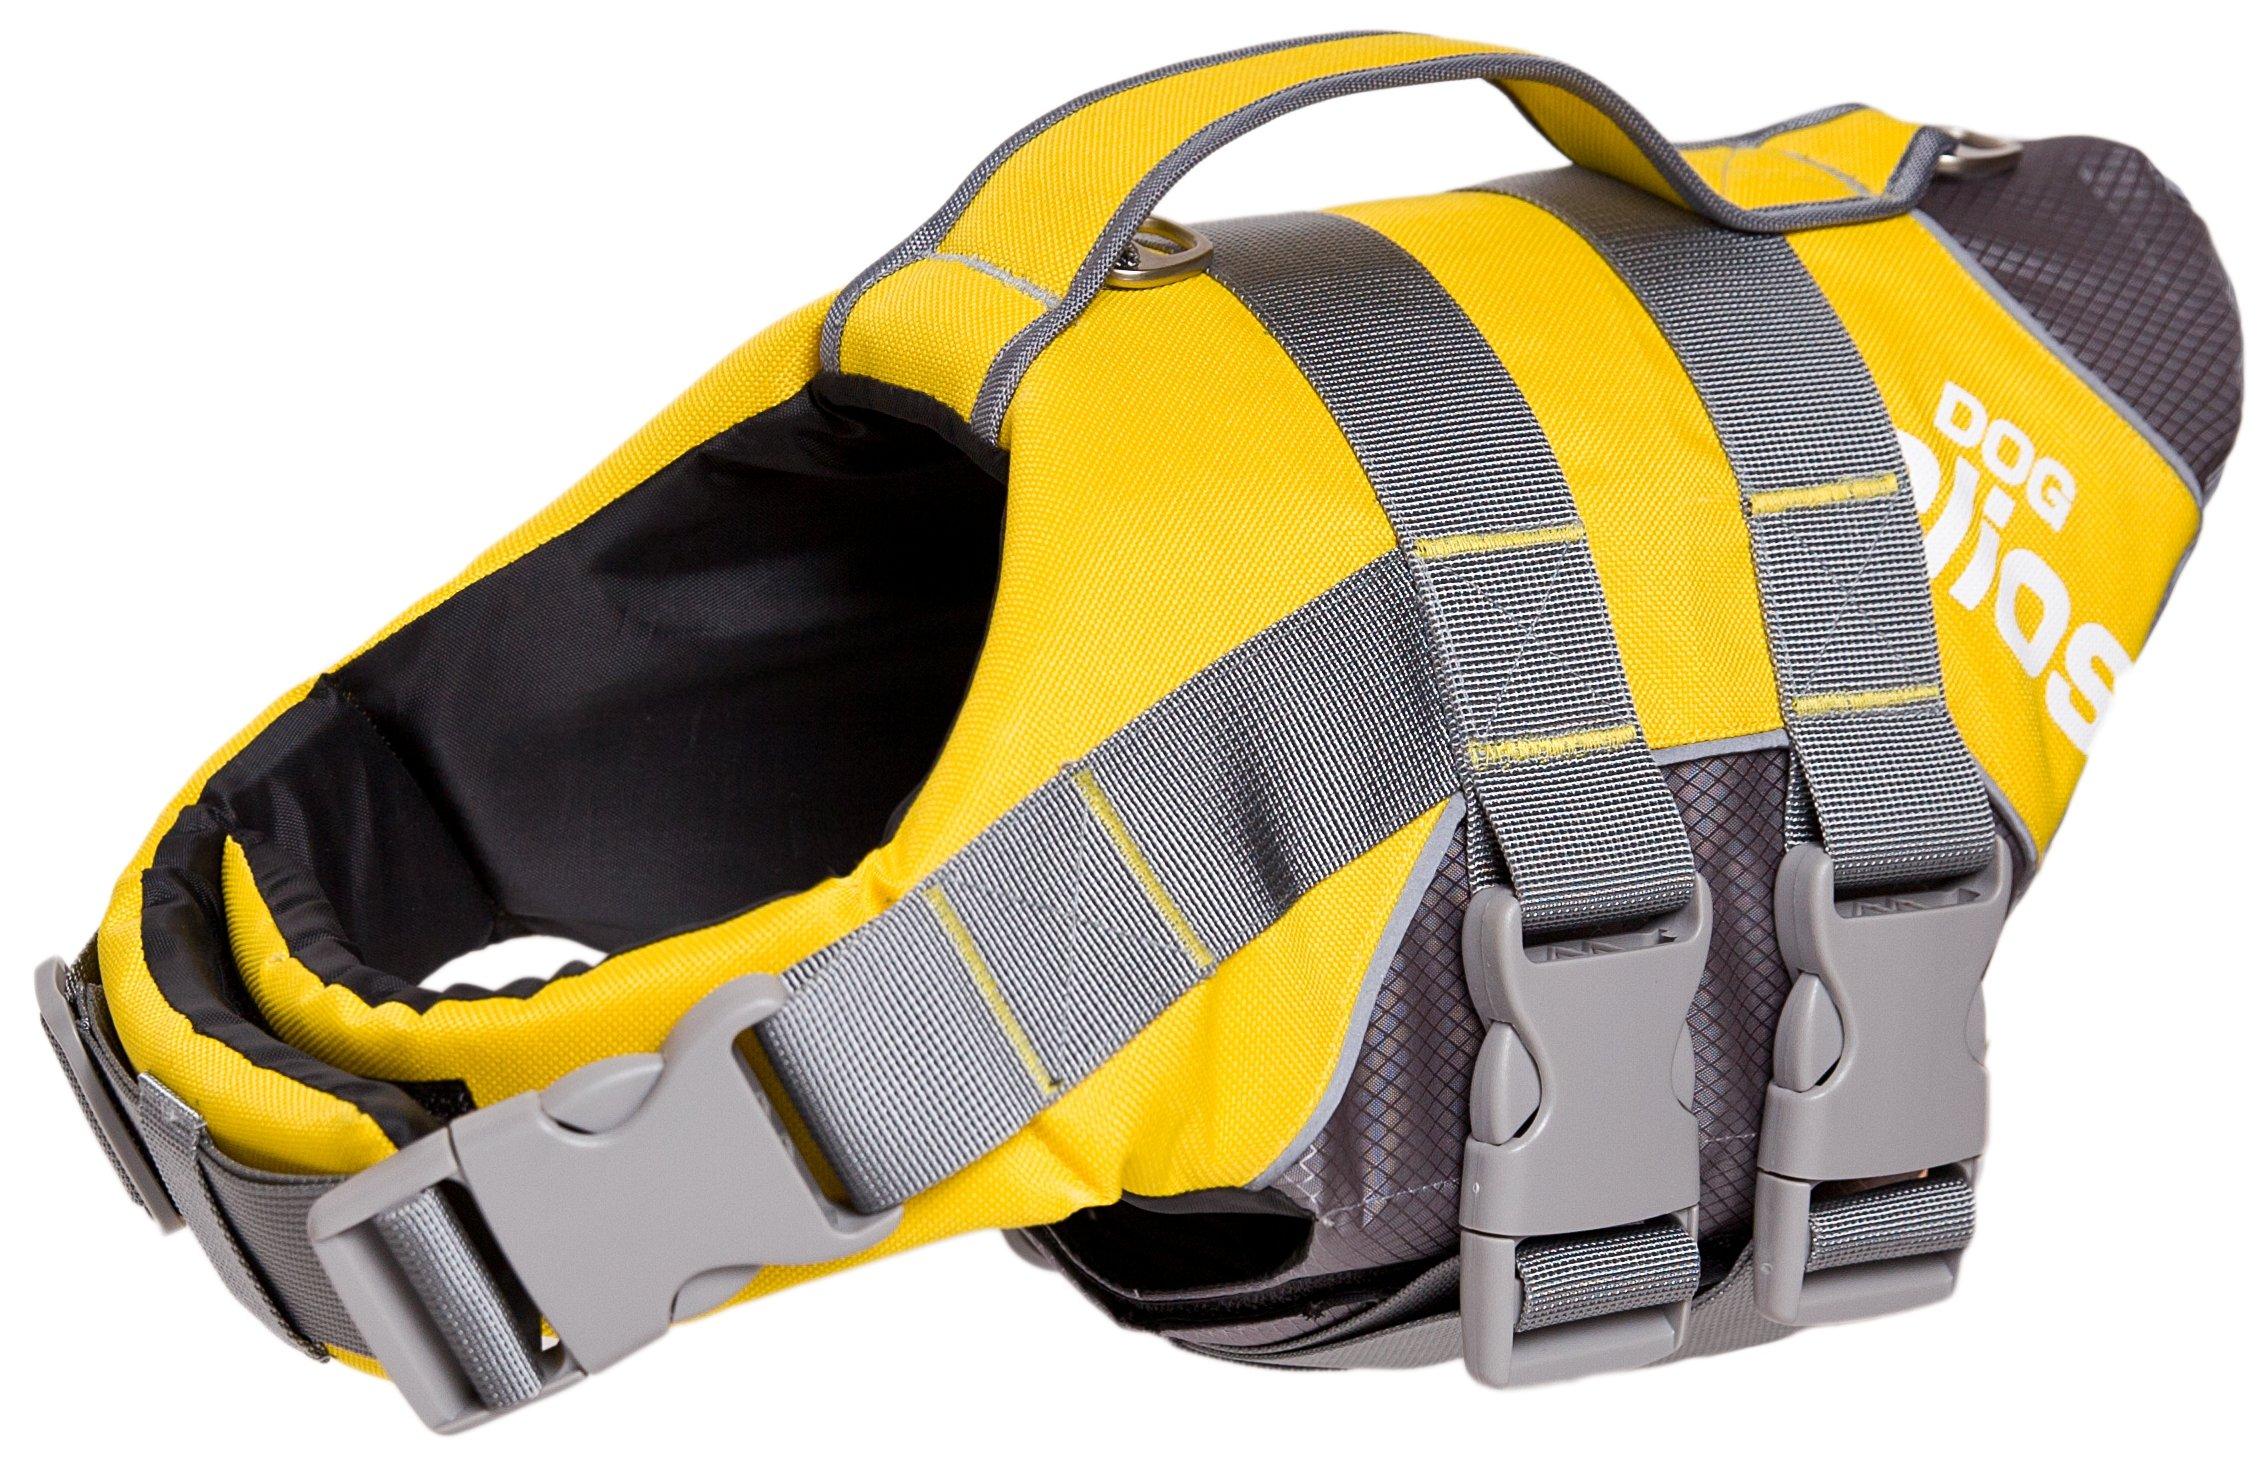 DOGHELIOS 'Splash-Explore' Outdoor Performance 3M Reflective and Adjustable Buoyant Safety Floating Pet Dog Life Jacket Vest Harness, Large, Yellow